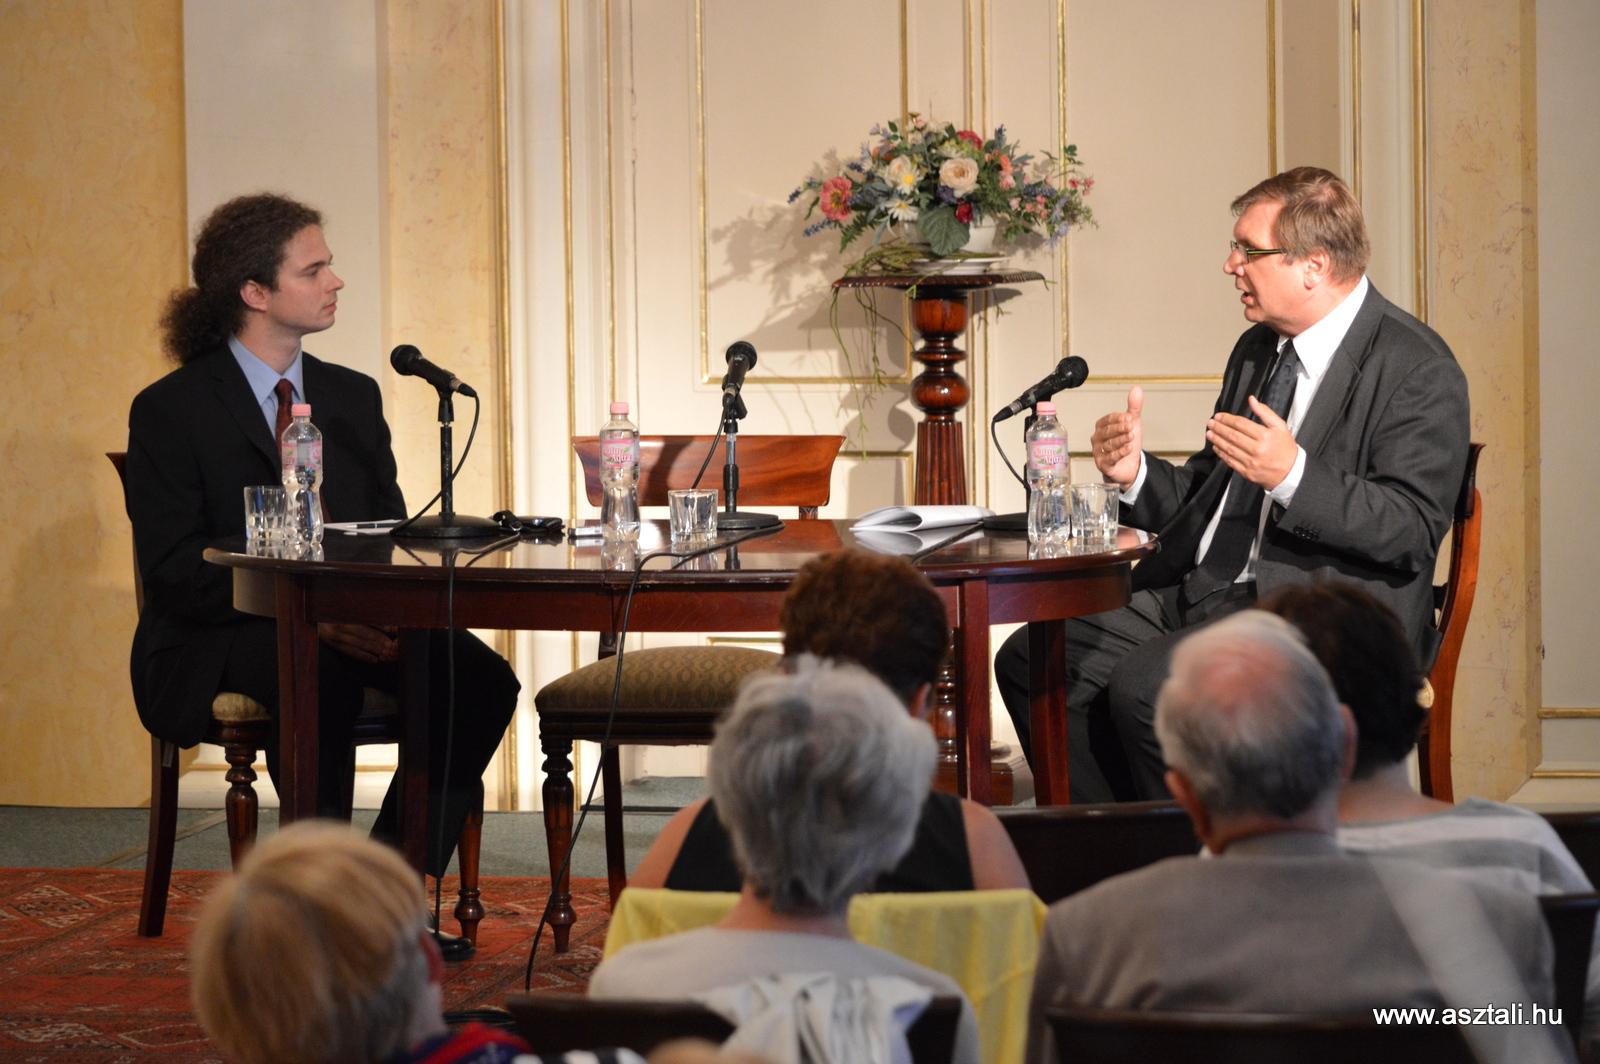 Európai kultúra? – Beszélgetés dr. Fabiny Tamás evangélikus püspökkel – Videóval!